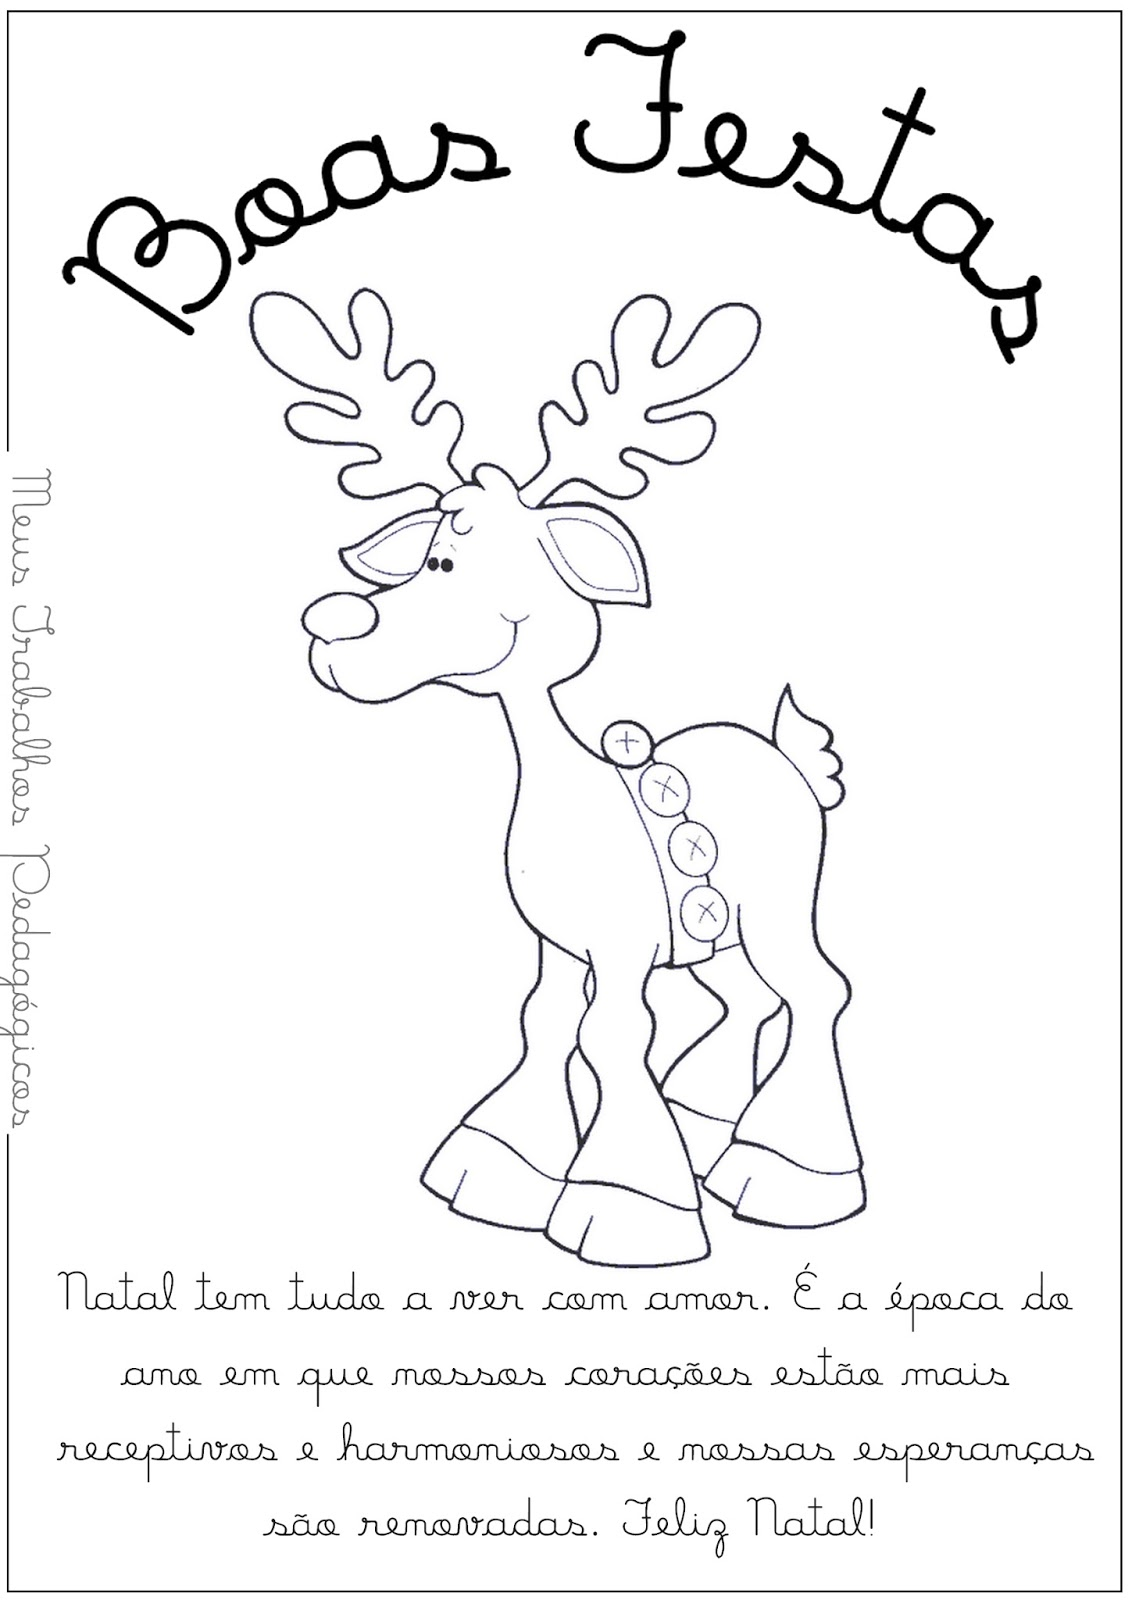 site de imagens para colorir de natal - Siga o Papai Noel Google traz desenhos para colorir online